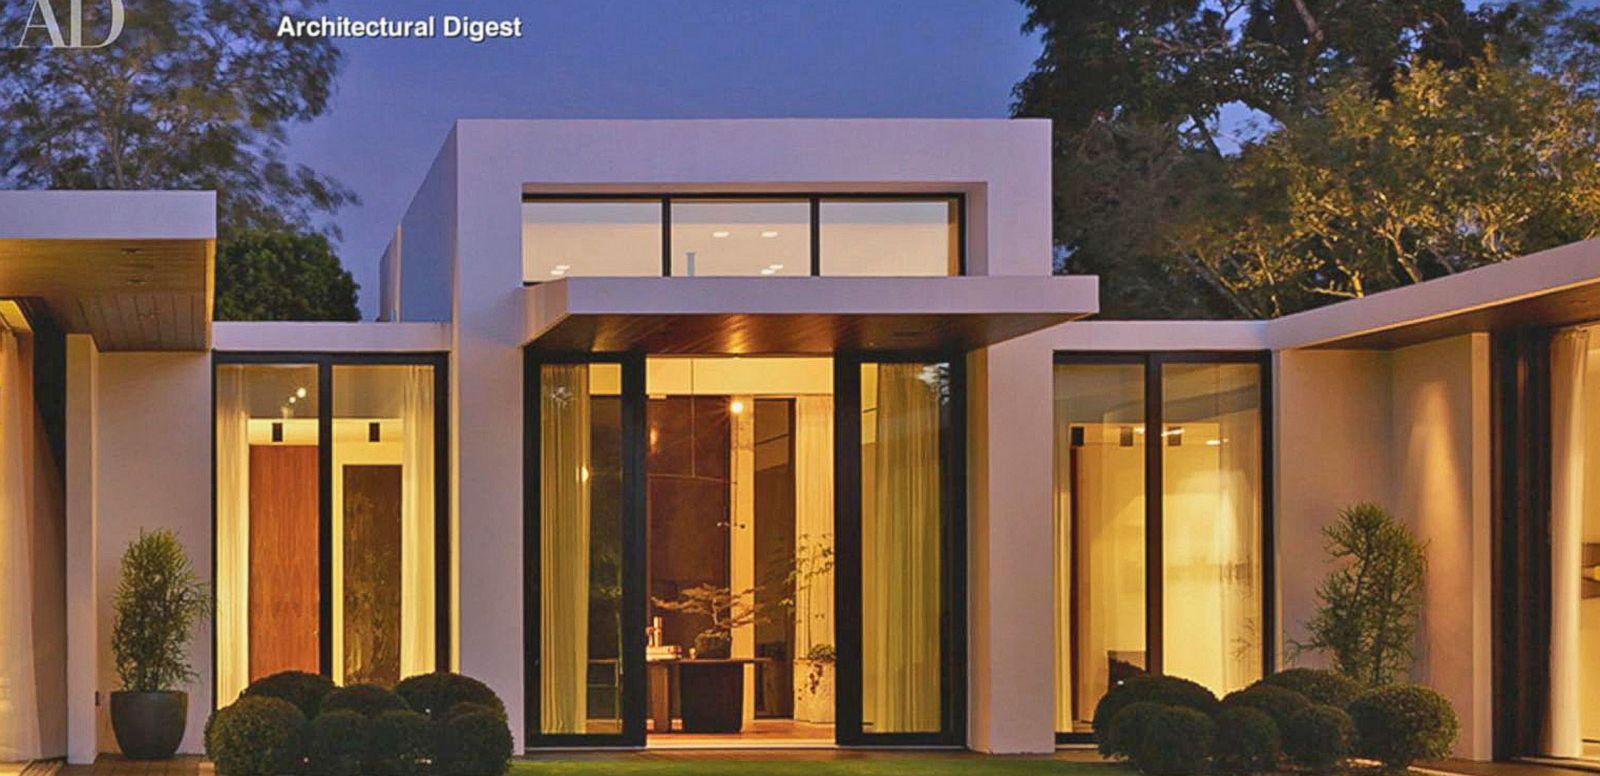 VIDEO: Alex Rodriguez Shows Off Florida Mansion in Architectural Digest